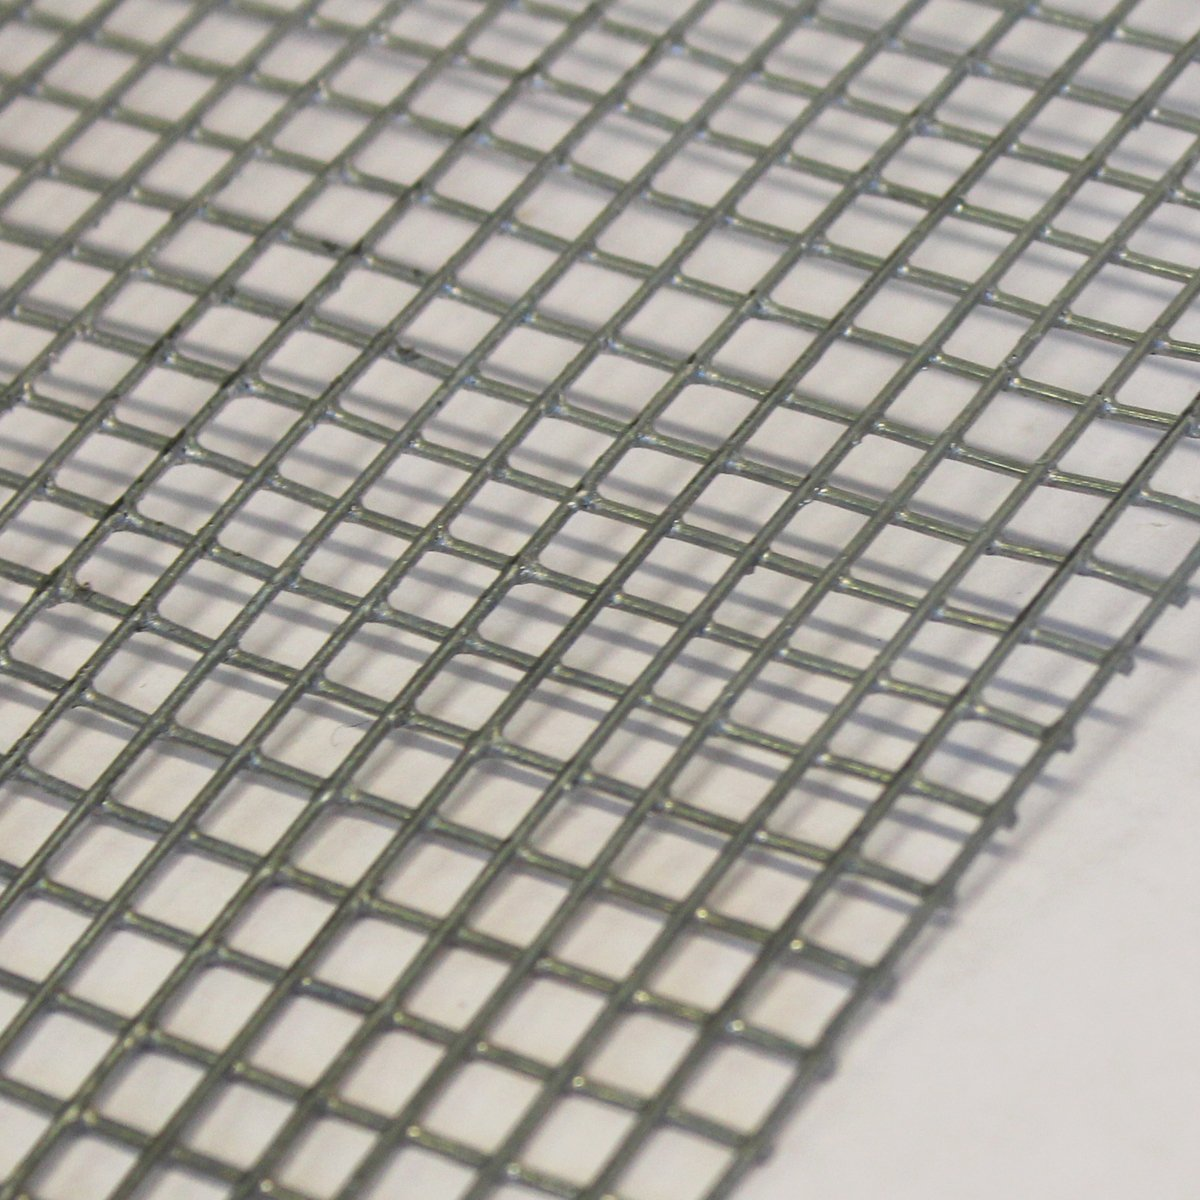 2 Pack of 3ftx2ft Welded Mesh Panels. 6mmx6mm holes. Galvanised ...